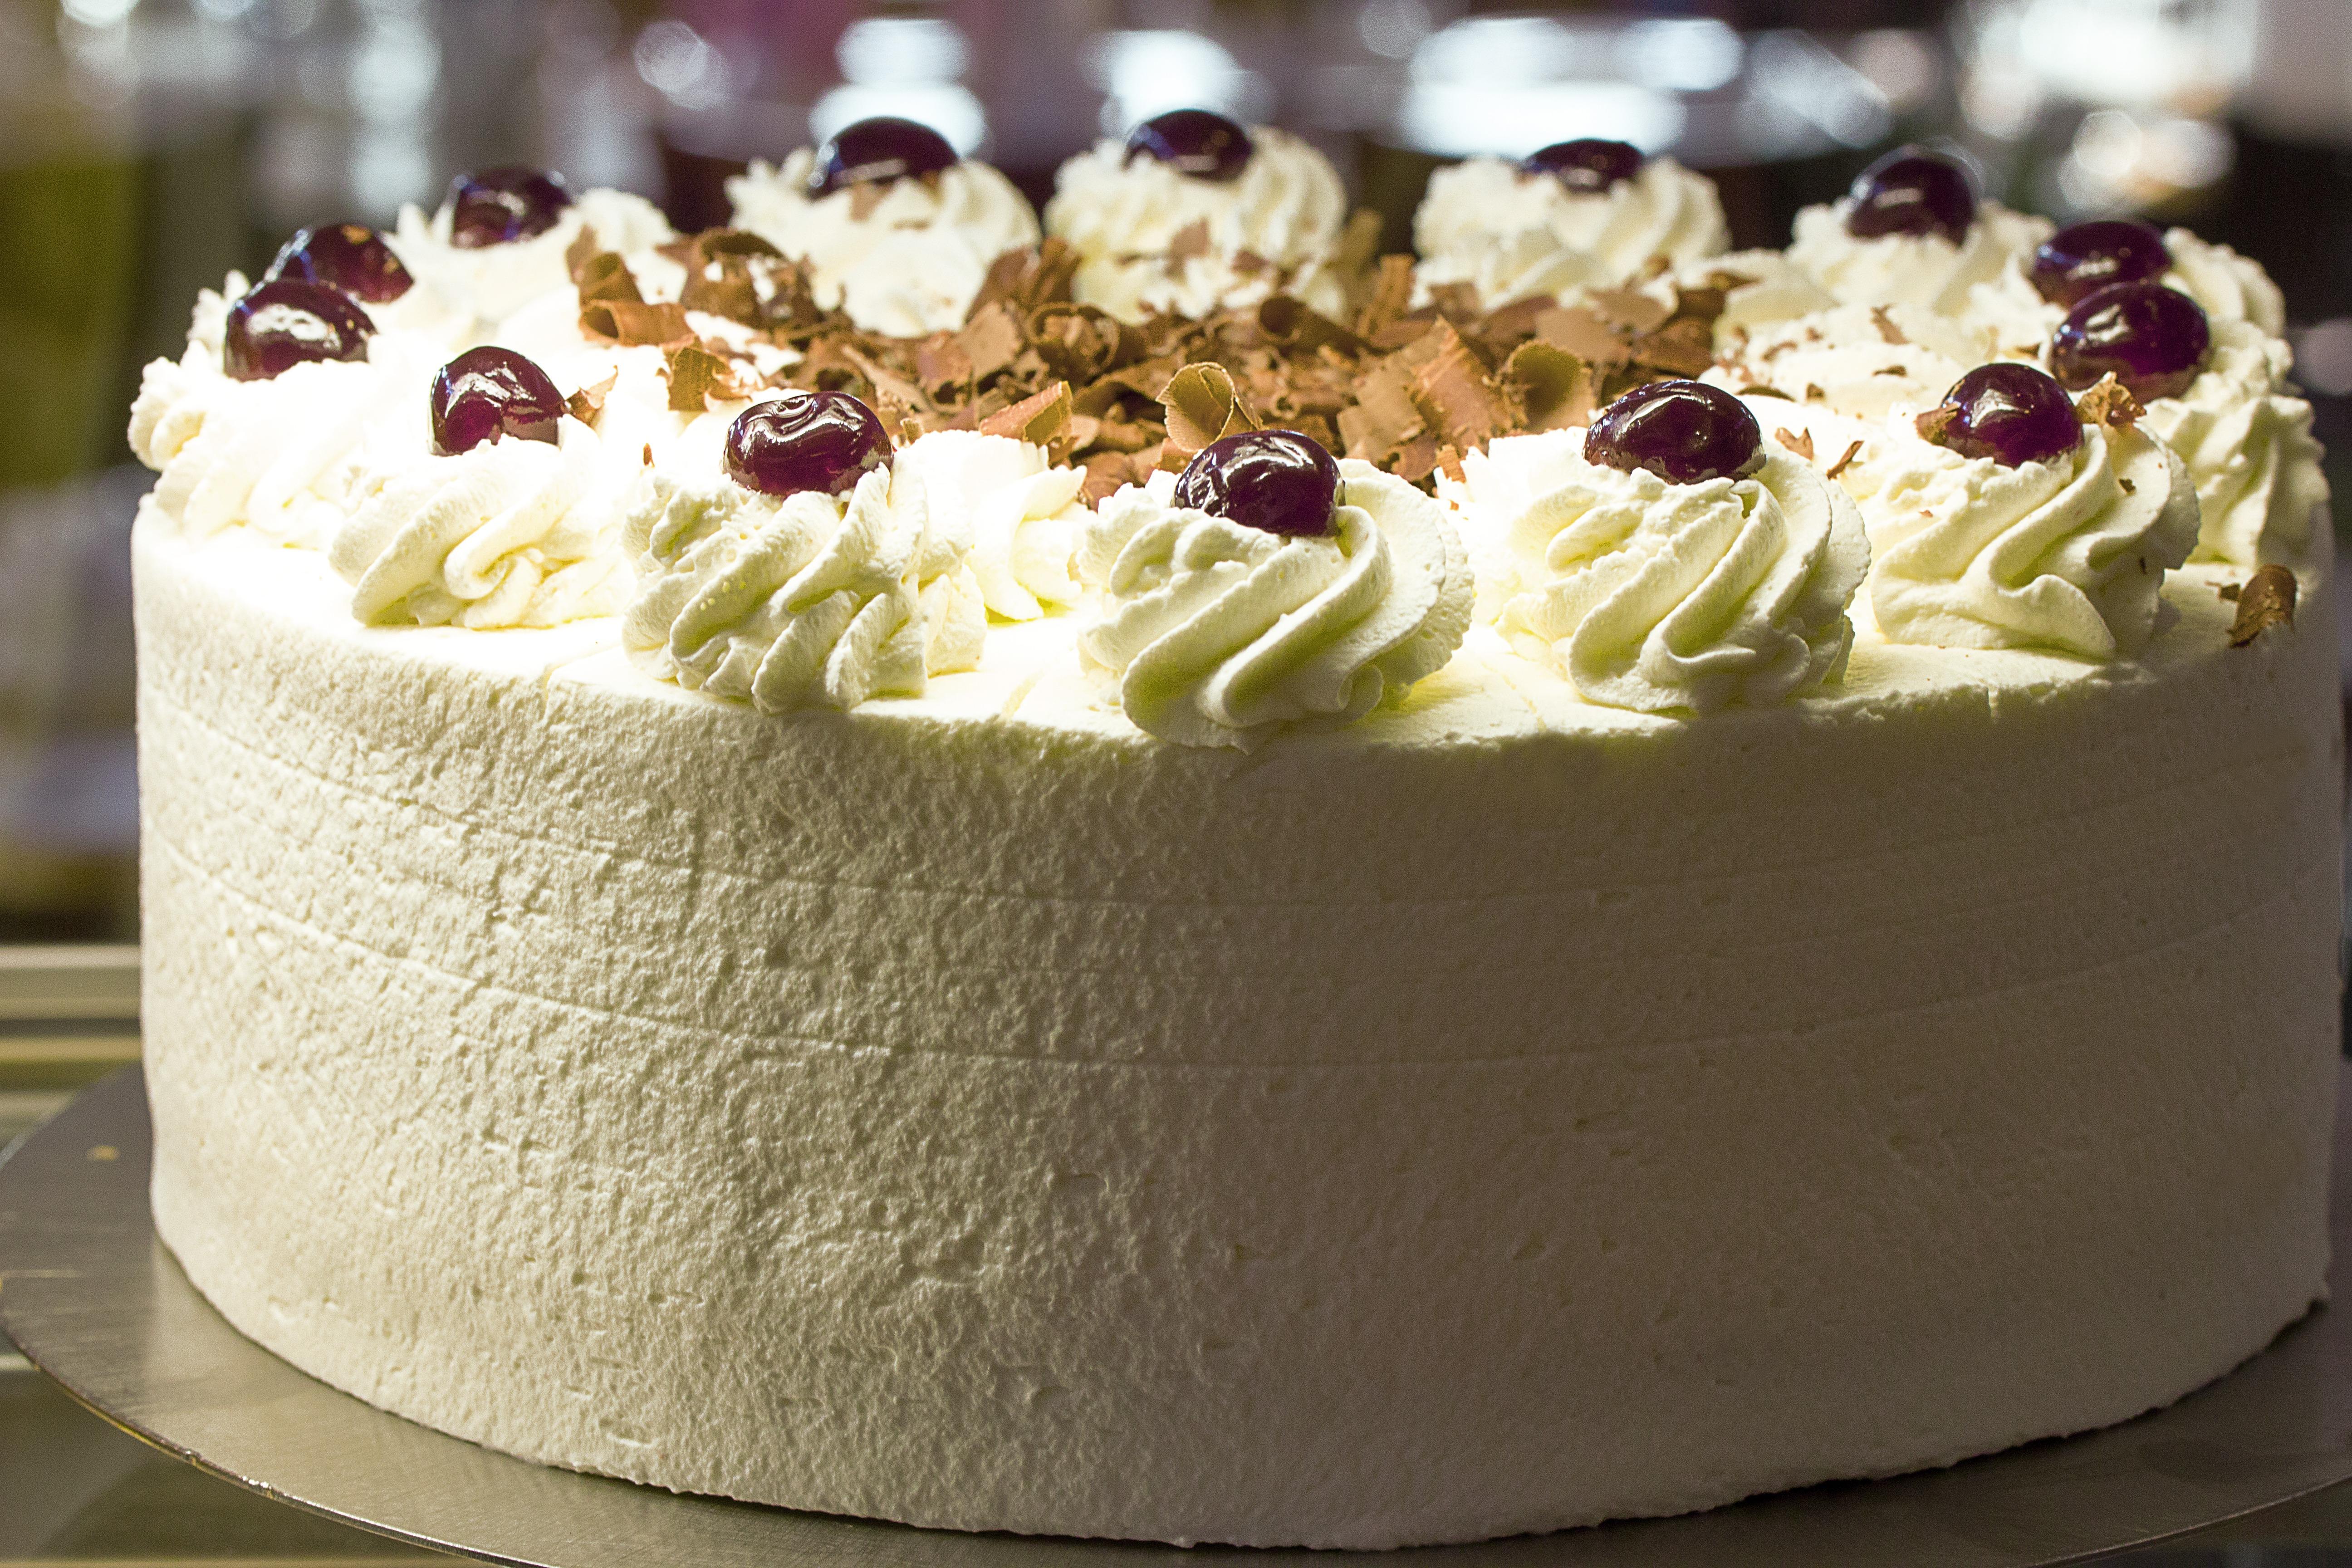 Free Images White Sweet Food Baking Dessert Cuisine